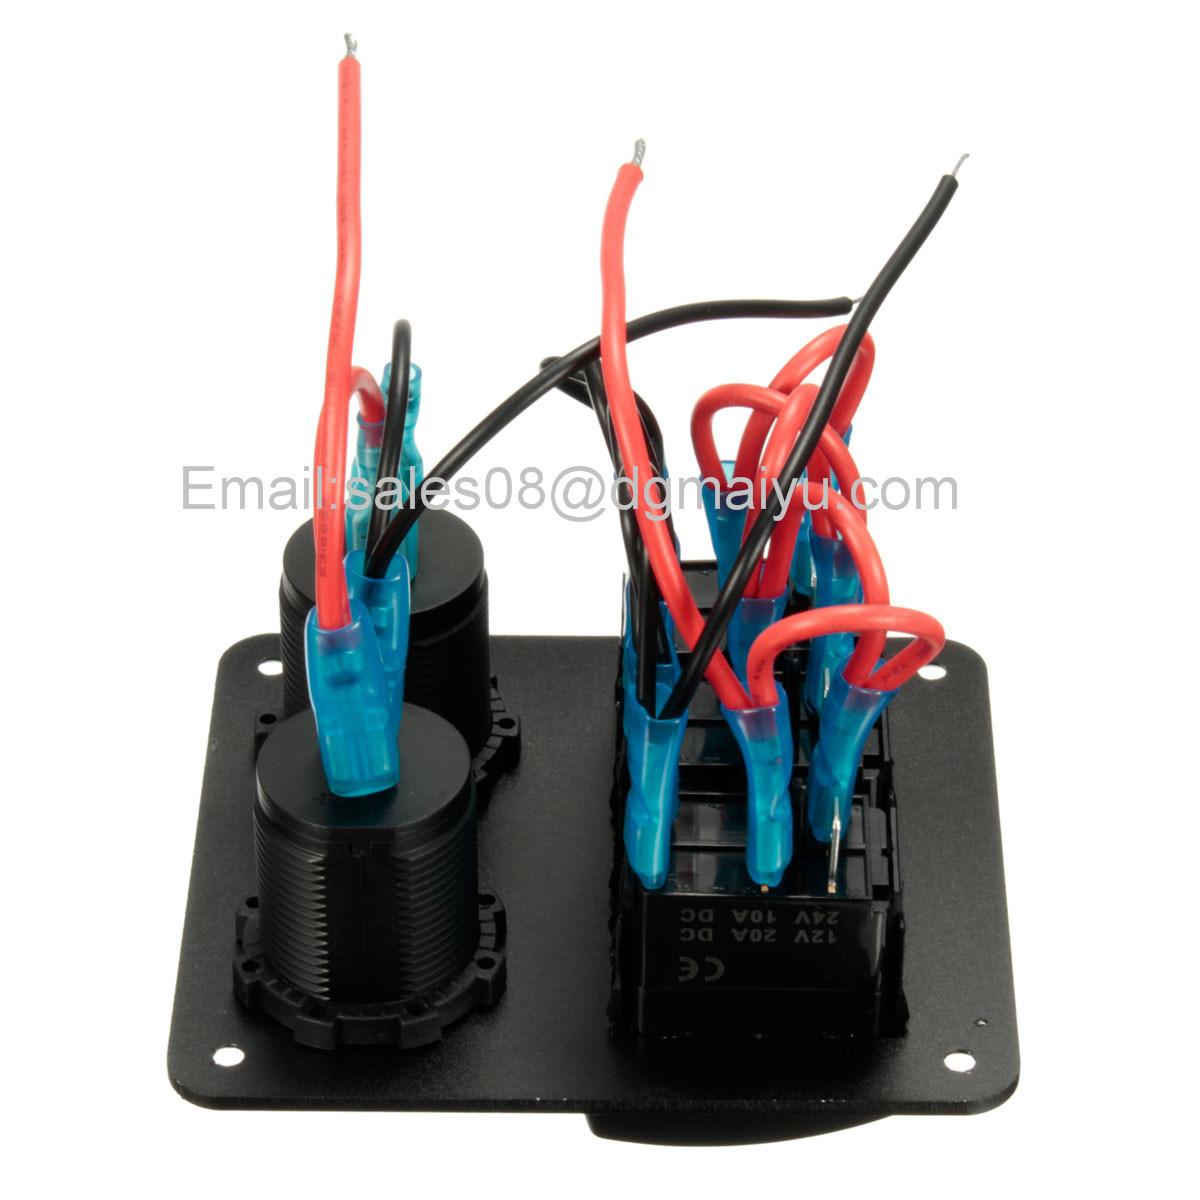 Waterproof 3 Gang Car Switch Panel LED Rocker with 2 USB Socket Cigaretter Plug for Marine/Boat/RV 12V